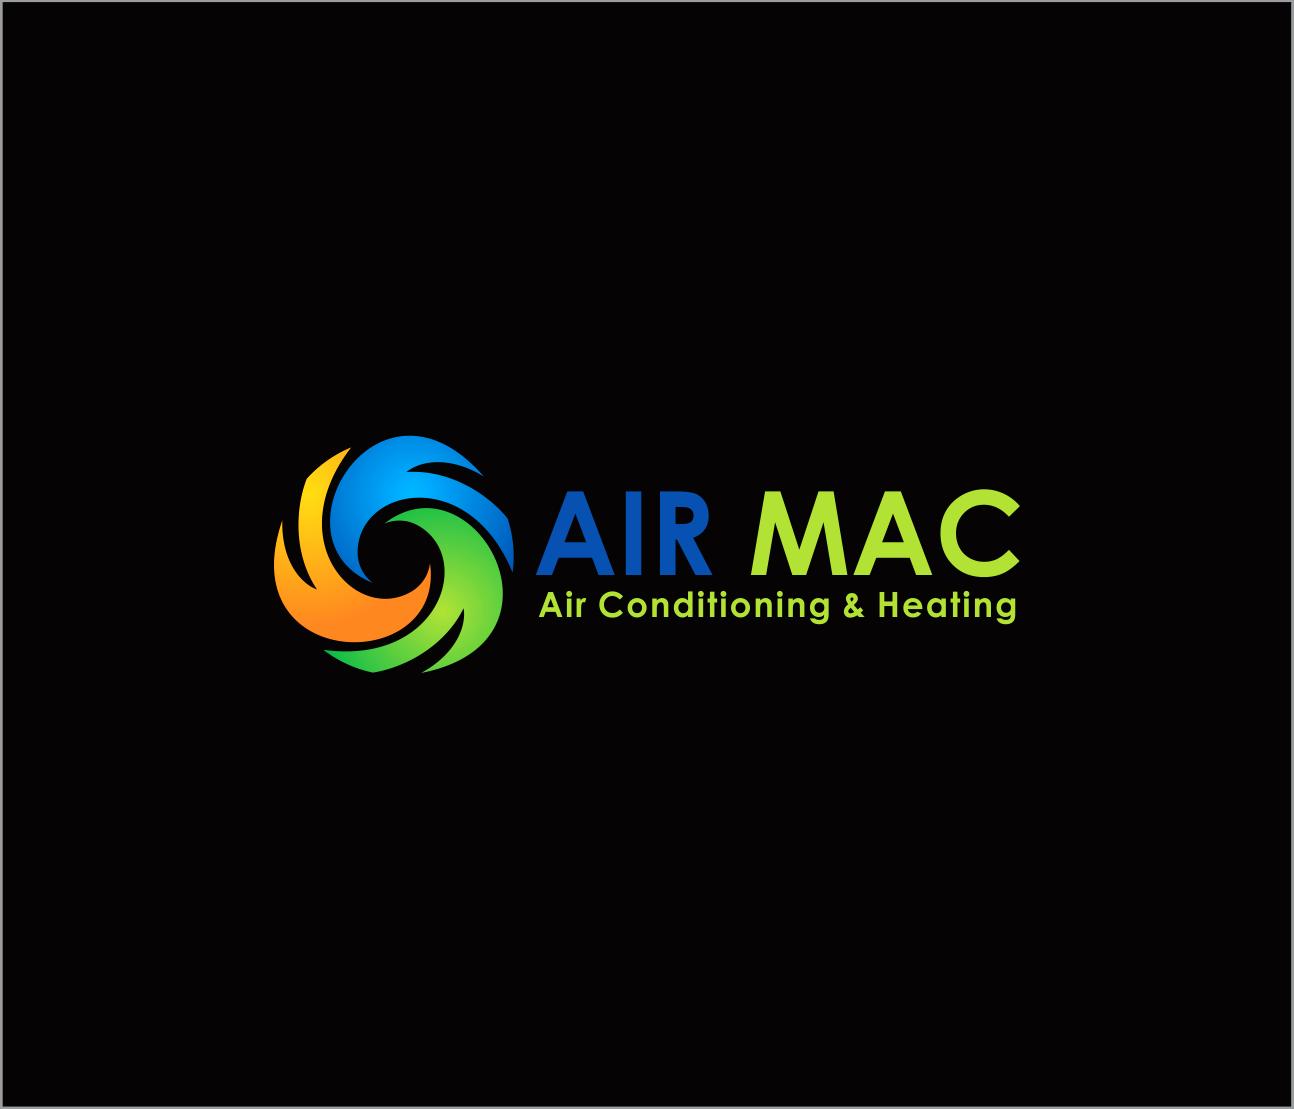 Logo Design by Armada Jamaluddin - Entry No. 40 in the Logo Design Contest Unique Logo Design Wanted for Air Mac.